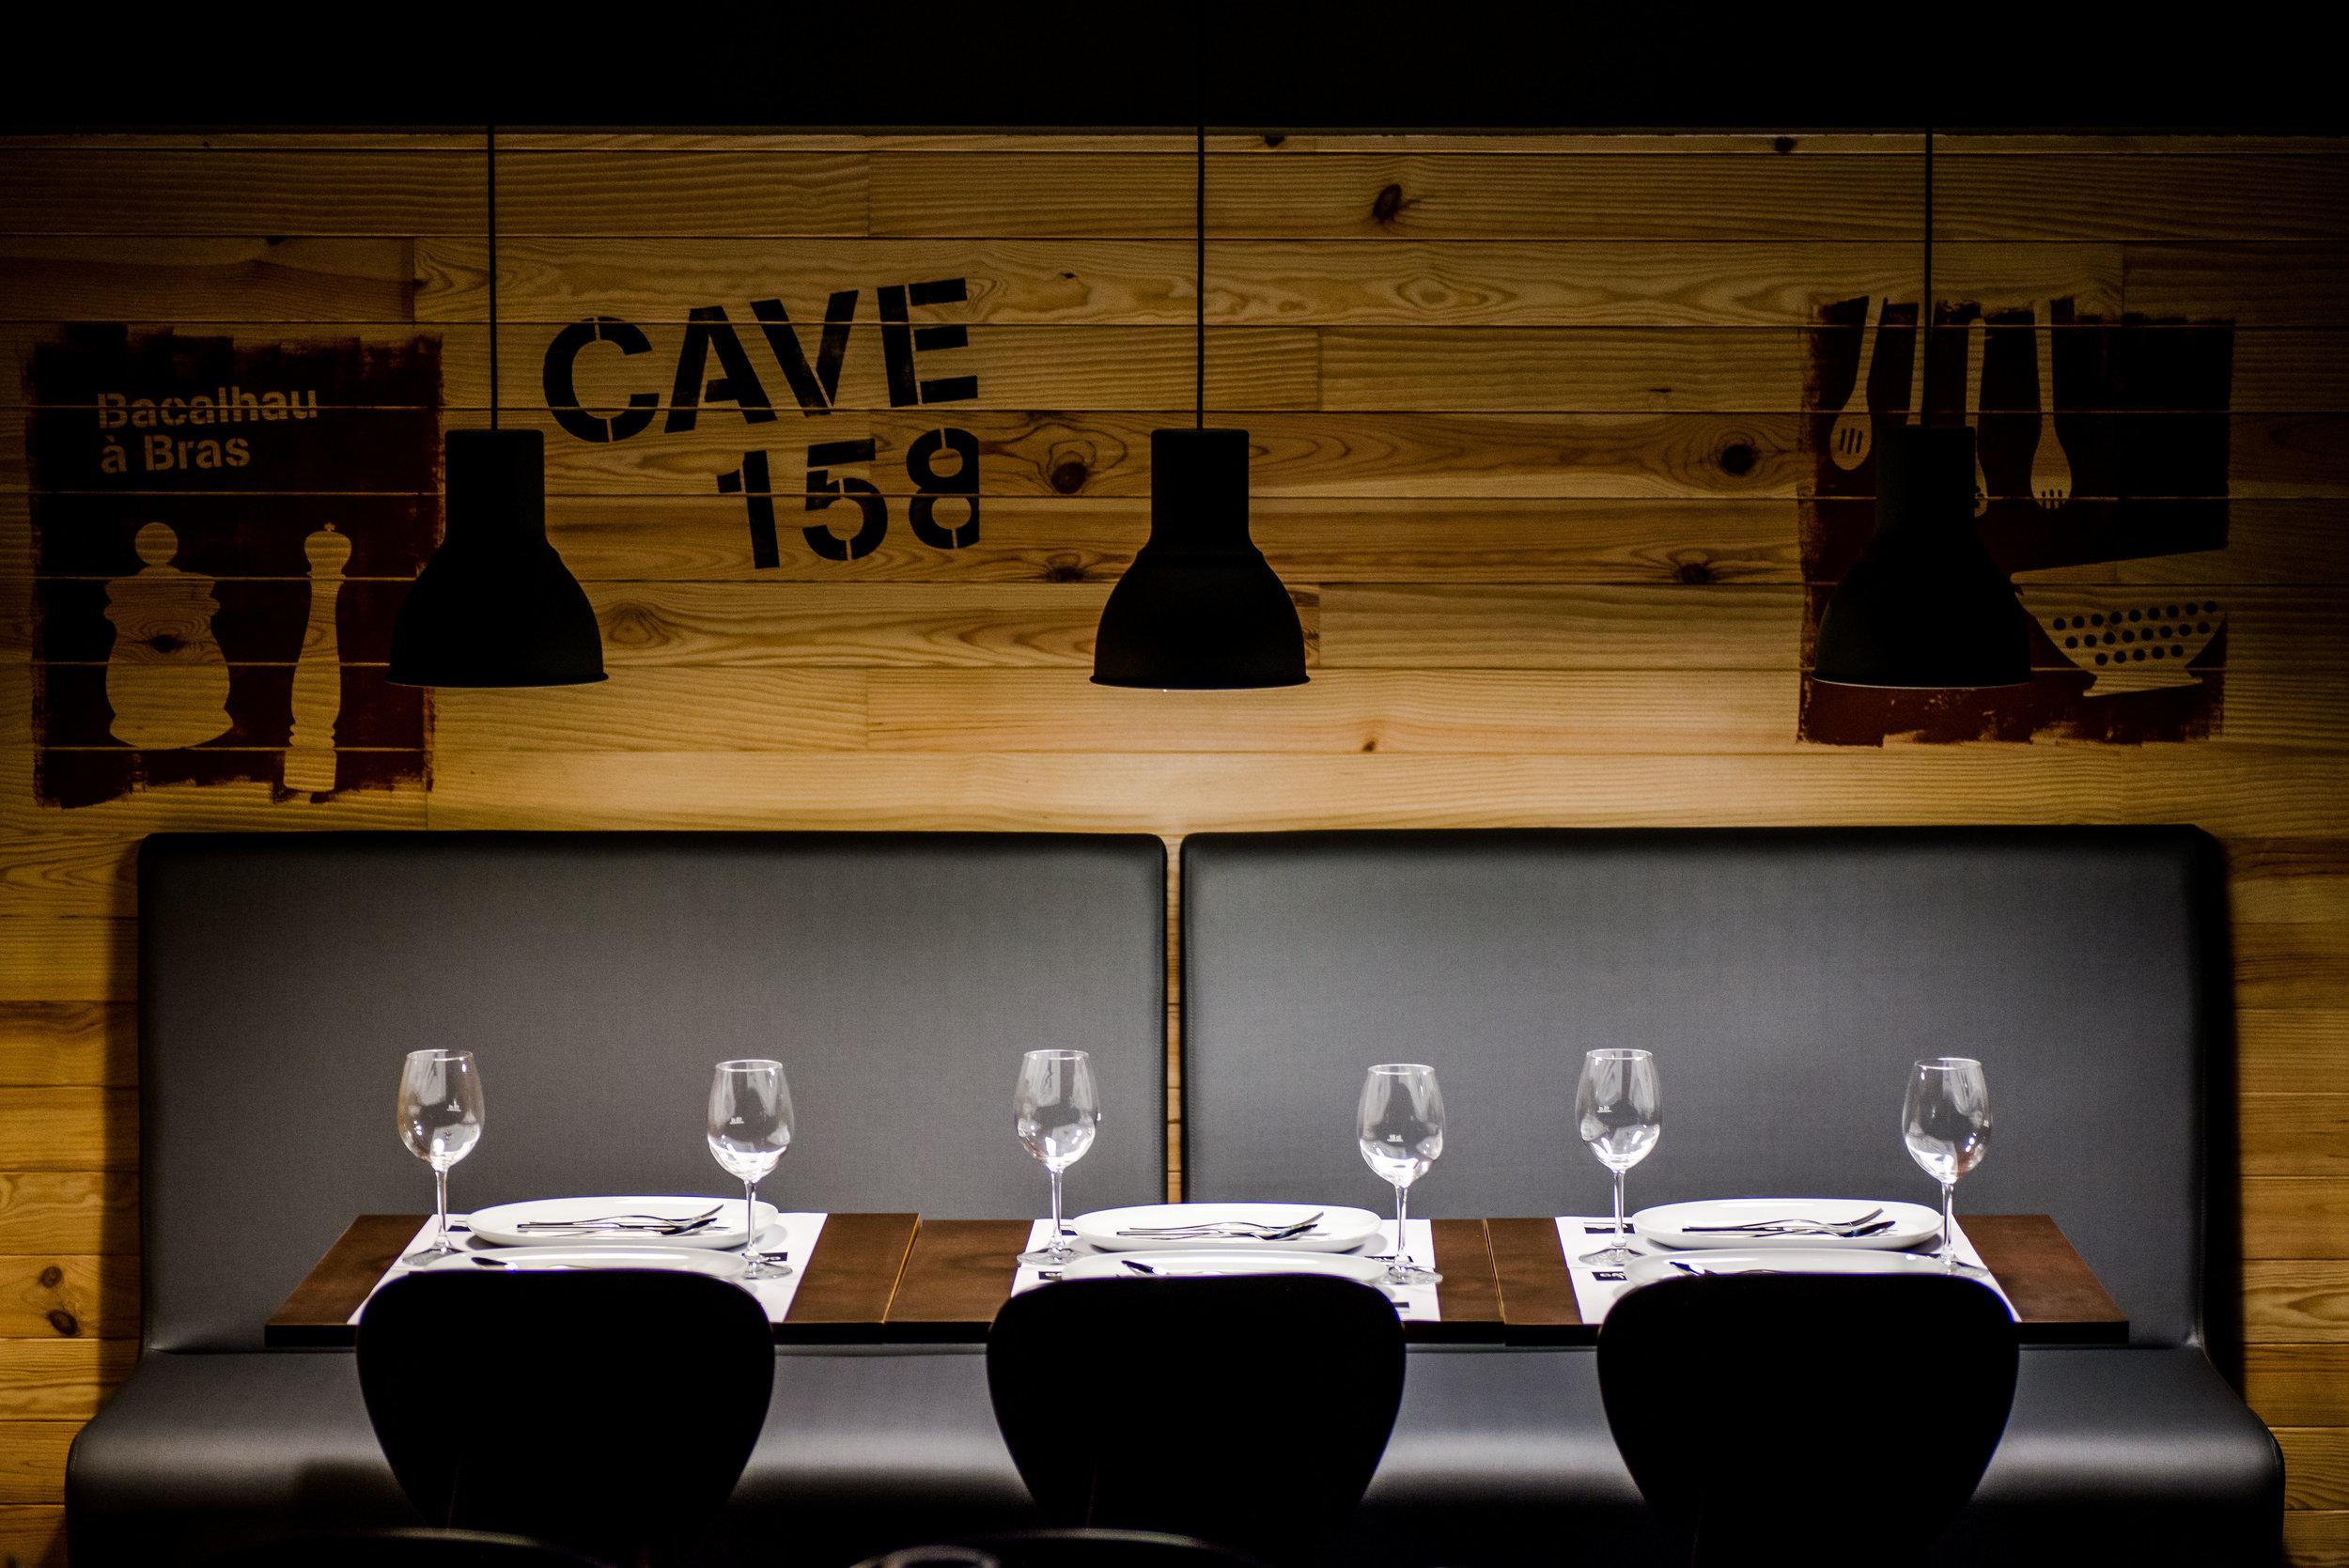 Cave 158-63.jpg